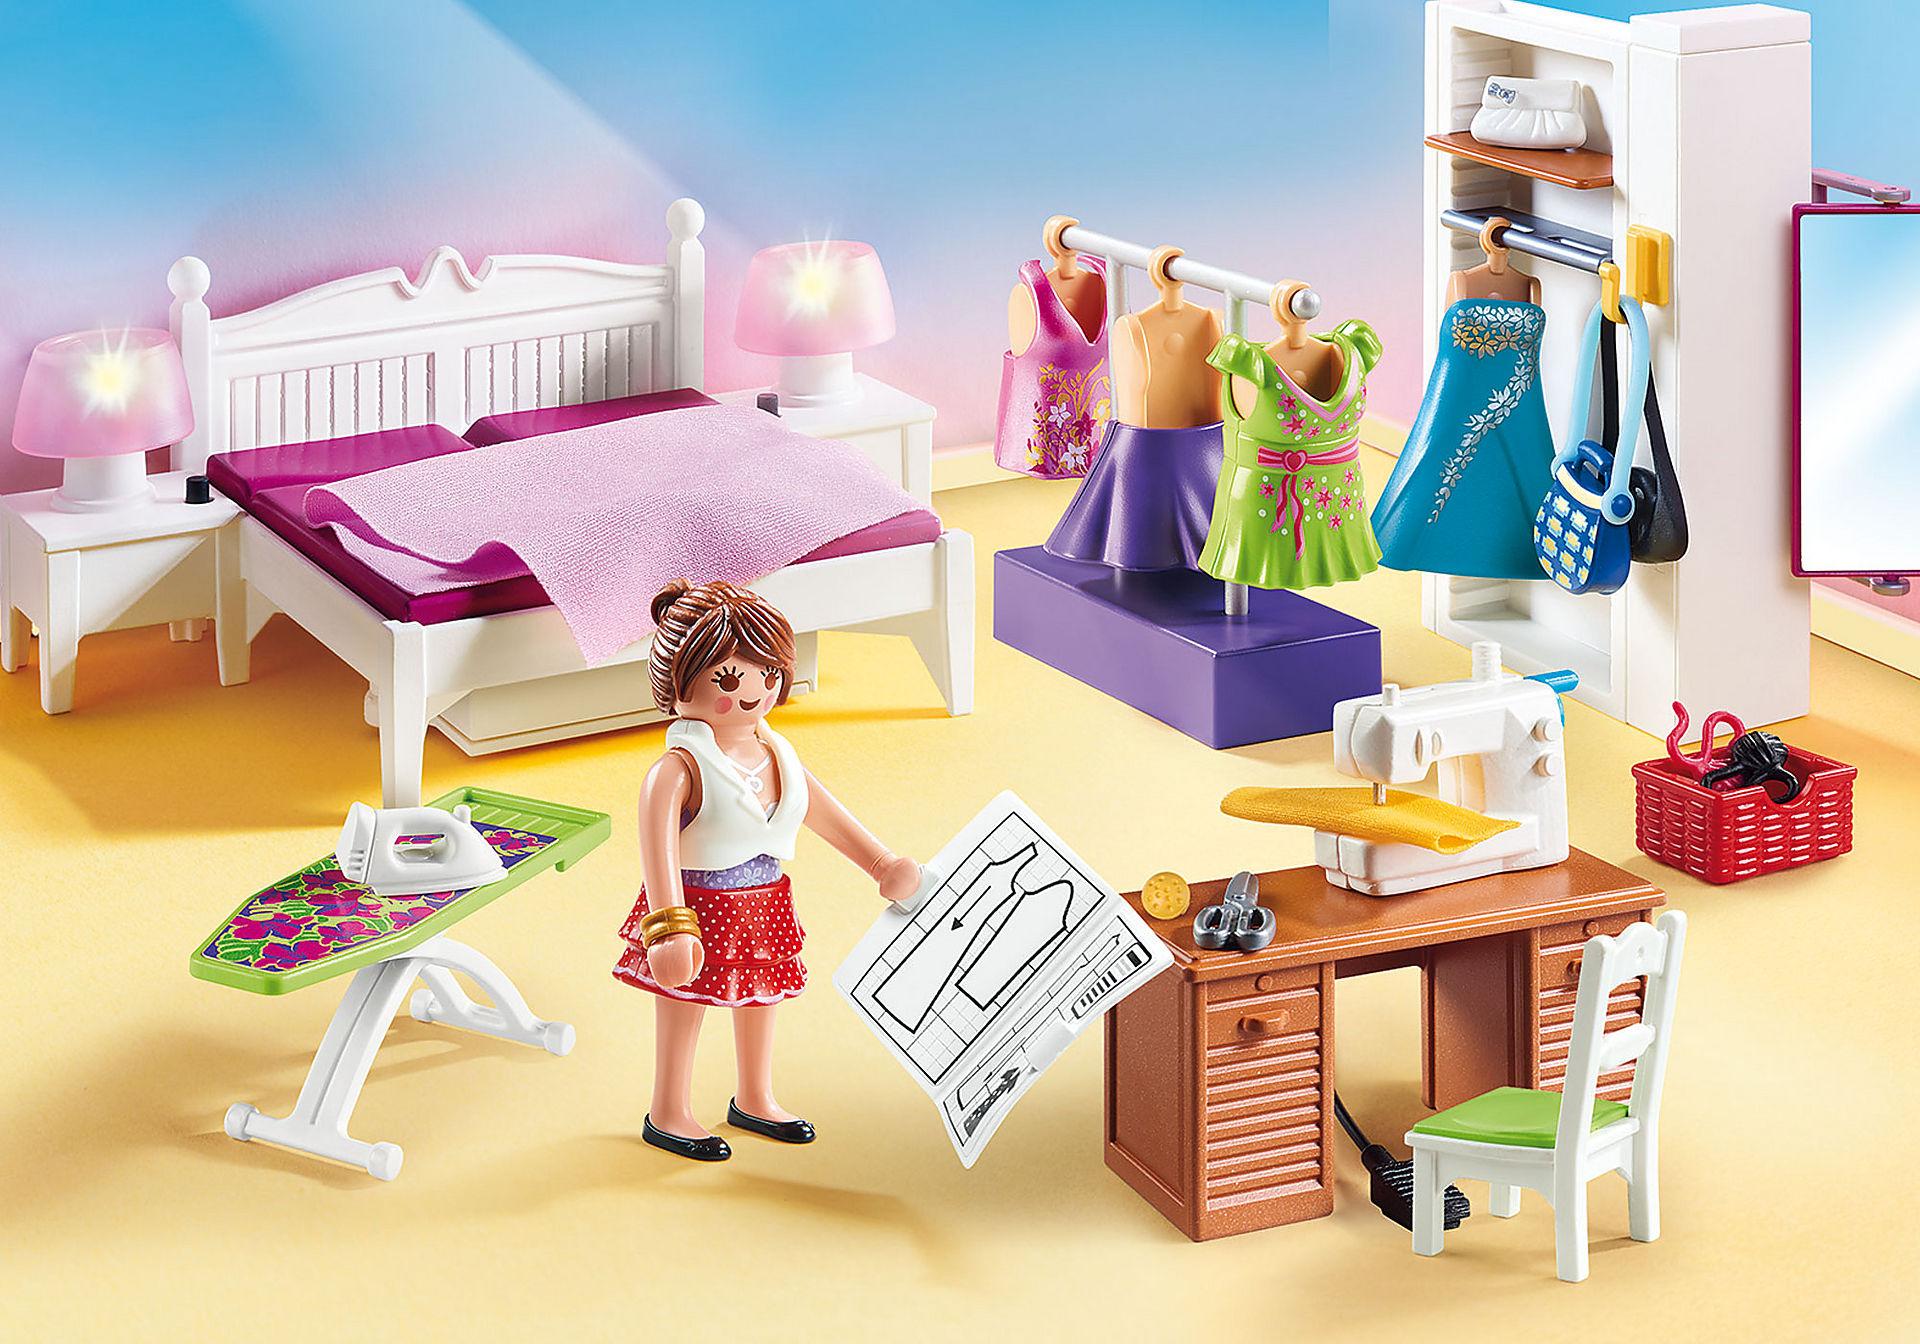 70208 Bedroom with Sewing Corner zoom image1